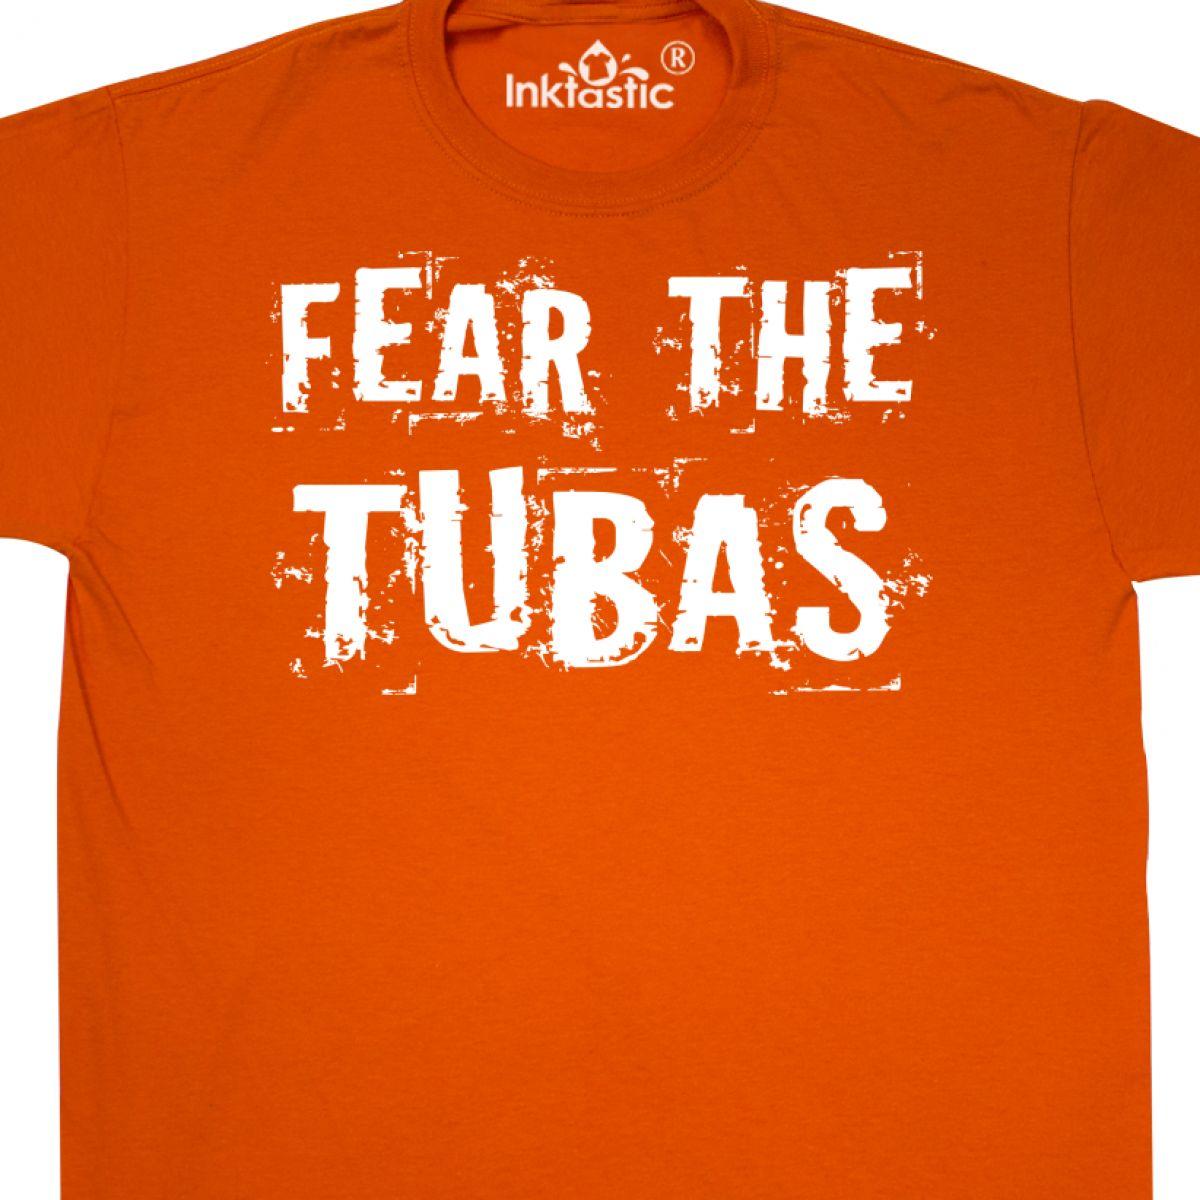 7b5b81b5 Inktastic Funny Fear The Tuba Humor T-Shirt Music Musician Musical ...